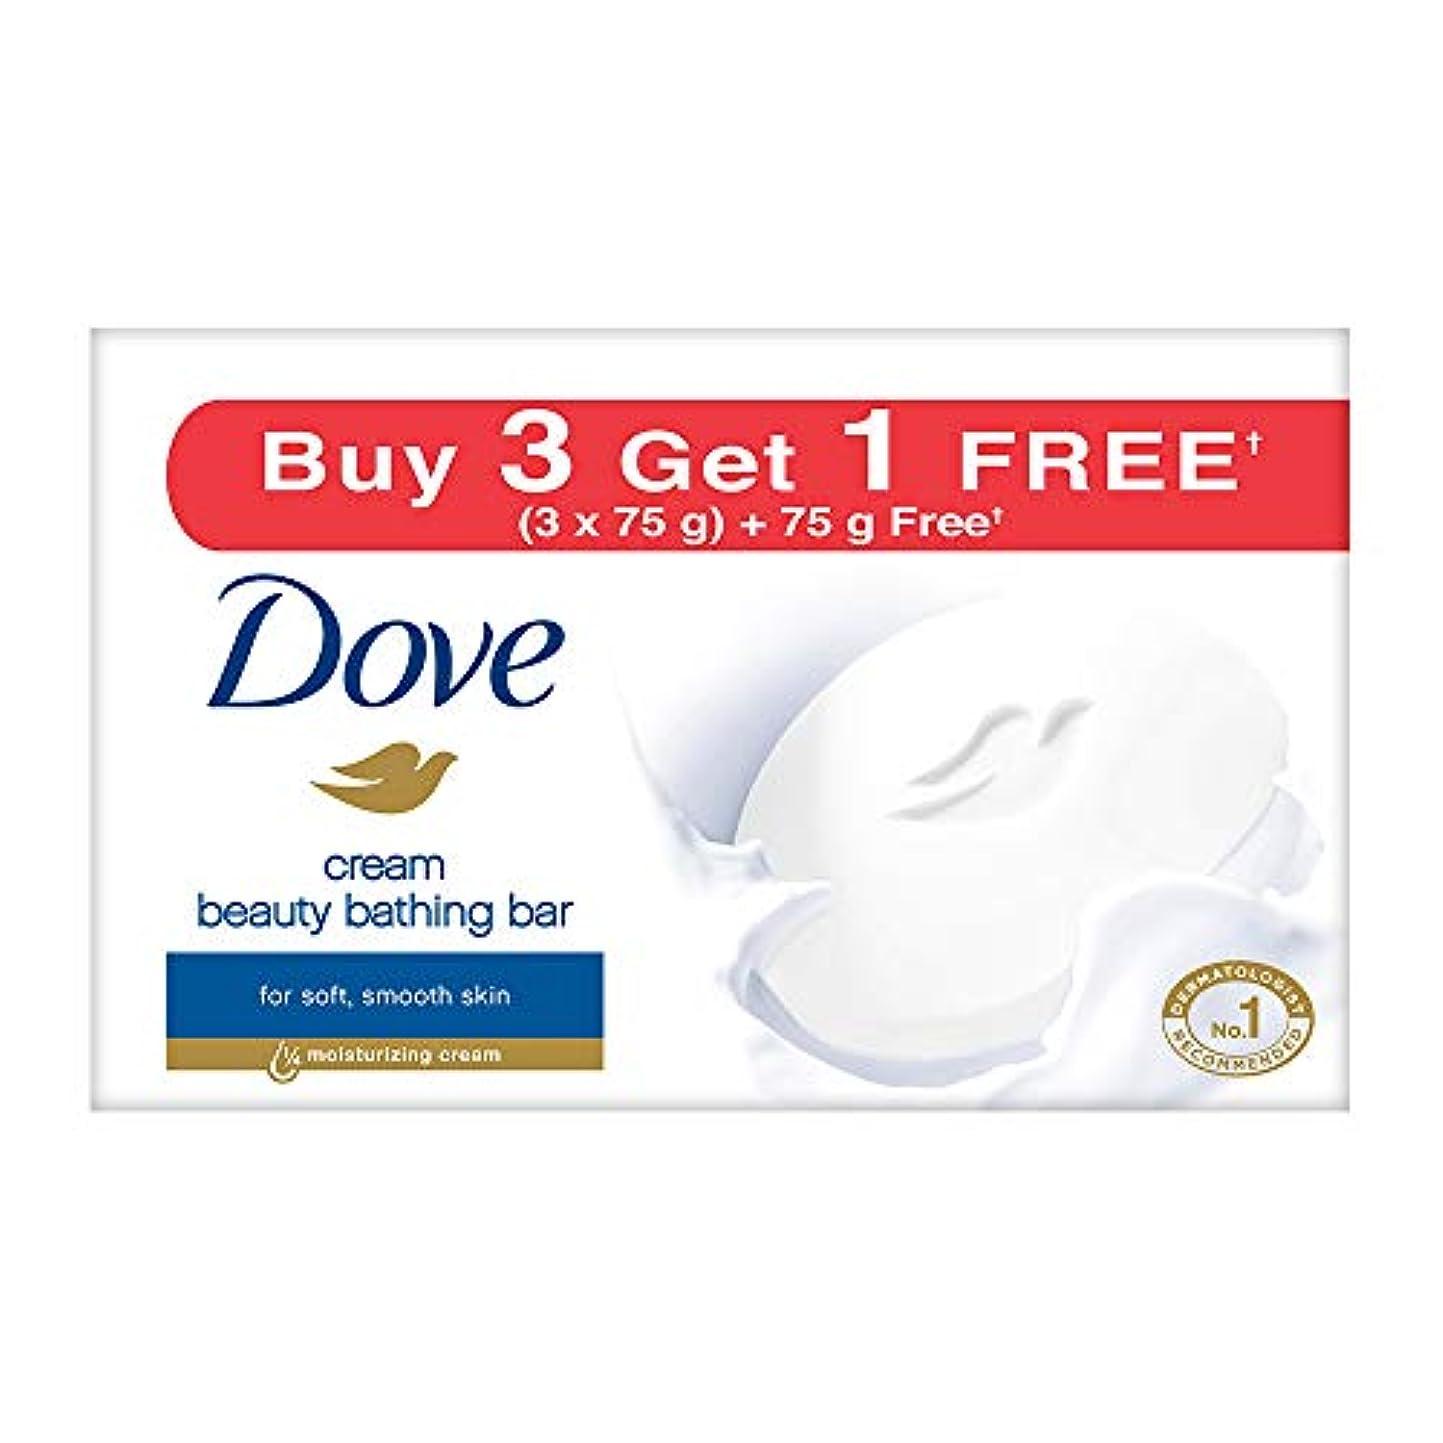 無臭命令信念Dove Cream Beauty Bathing Bar, 4x75g